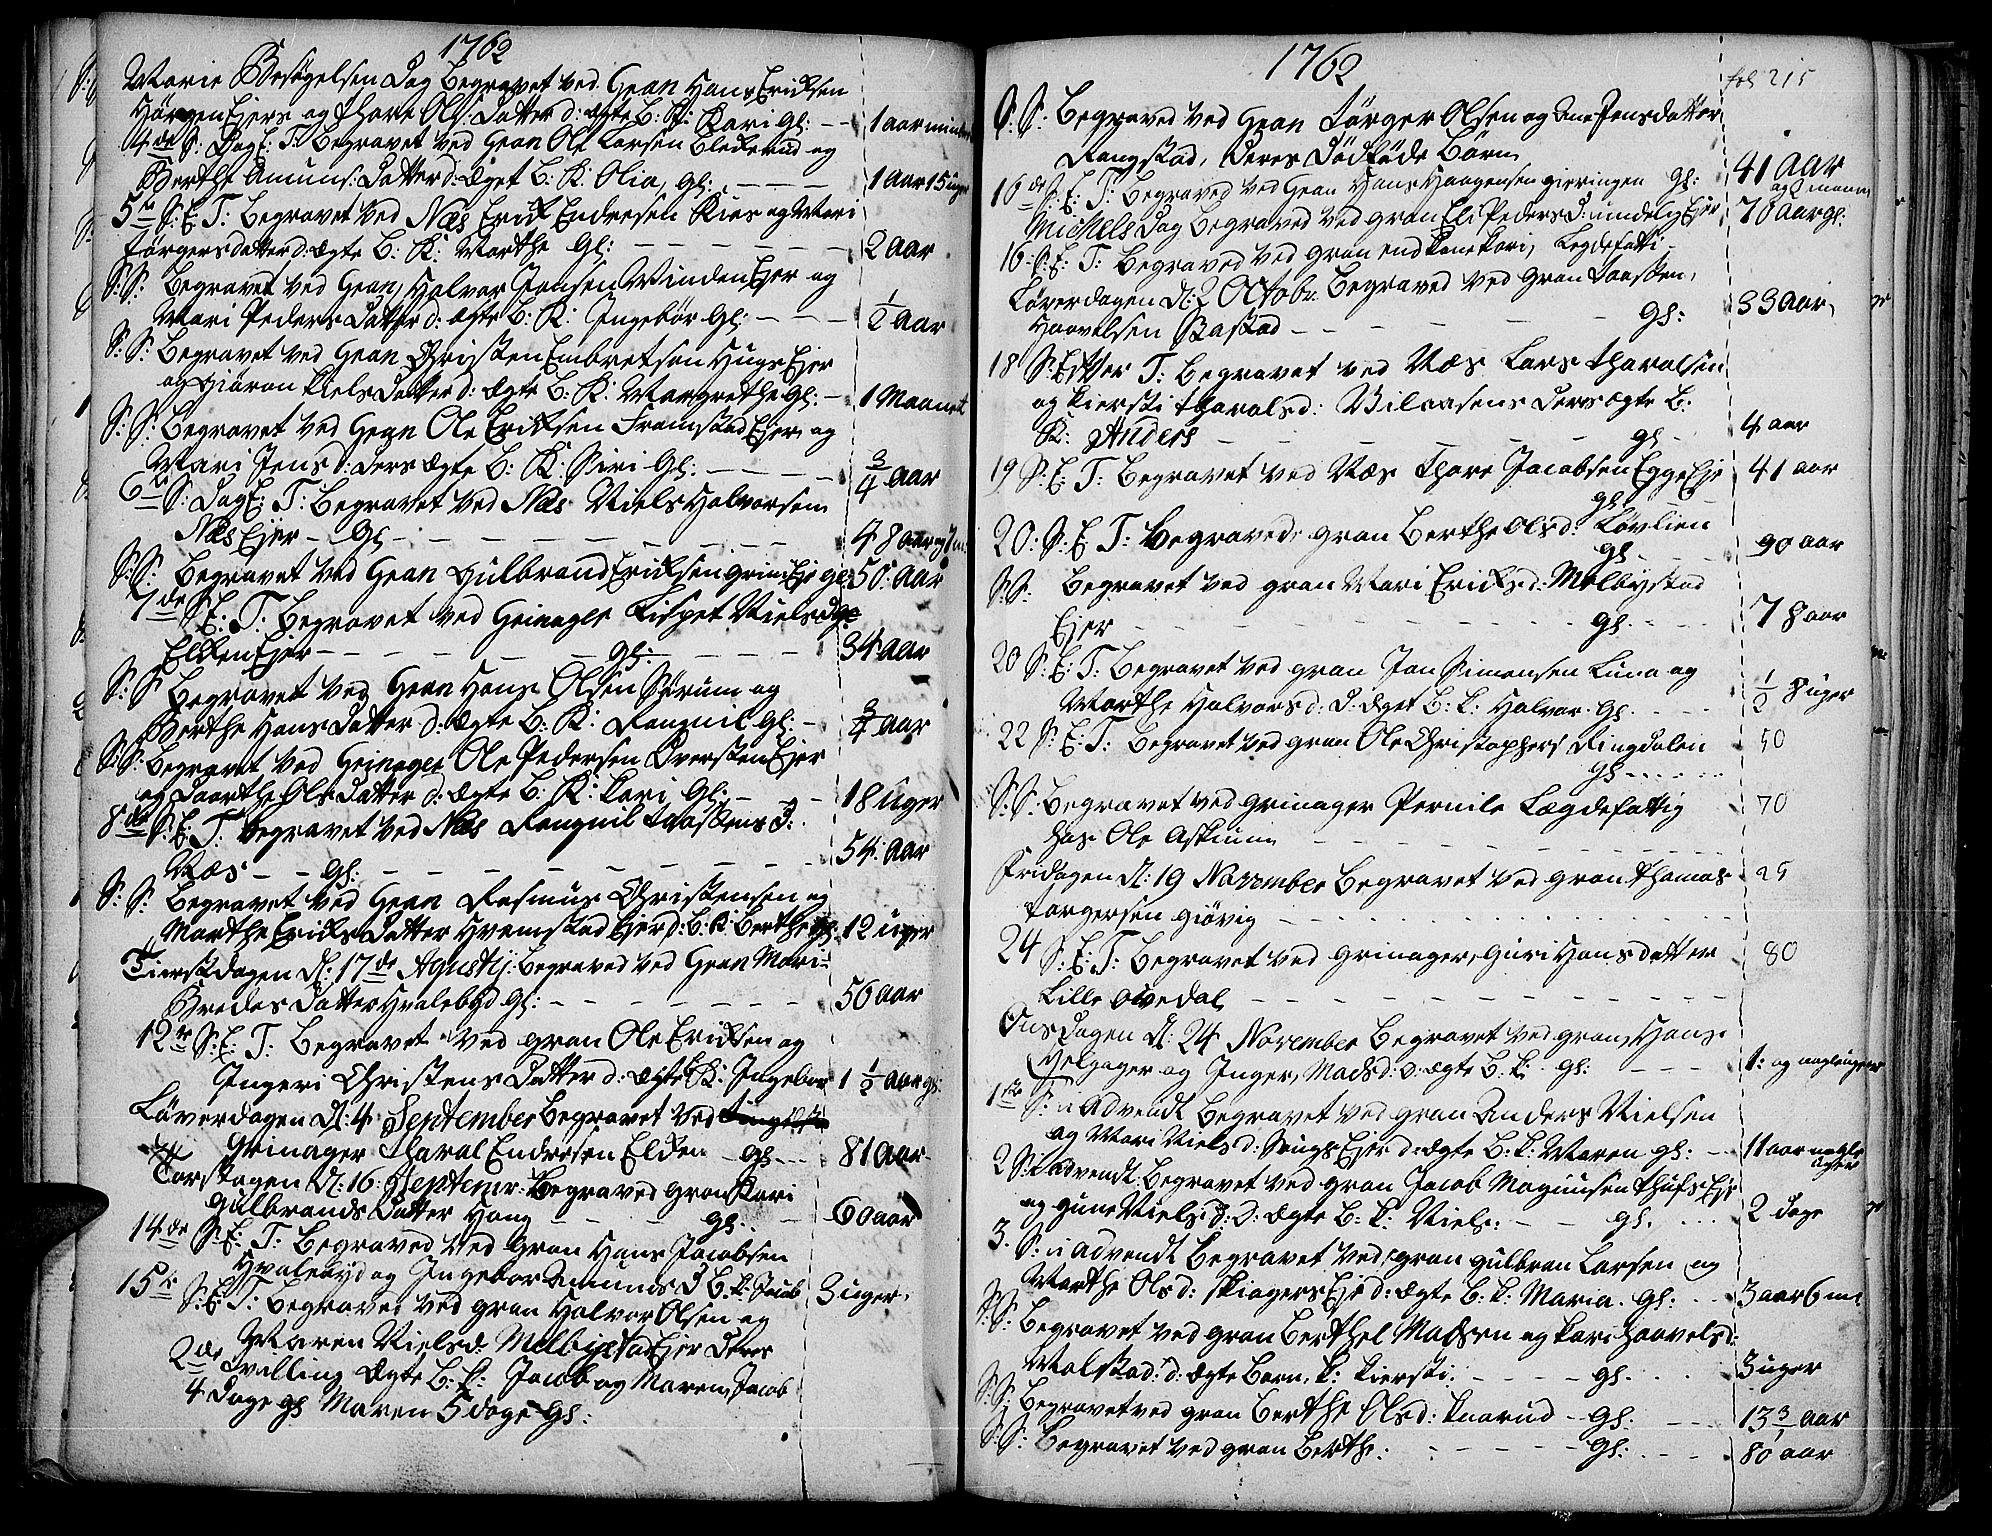 SAH, Gran prestekontor, Ministerialbok nr. 4, 1759-1775, s. 215